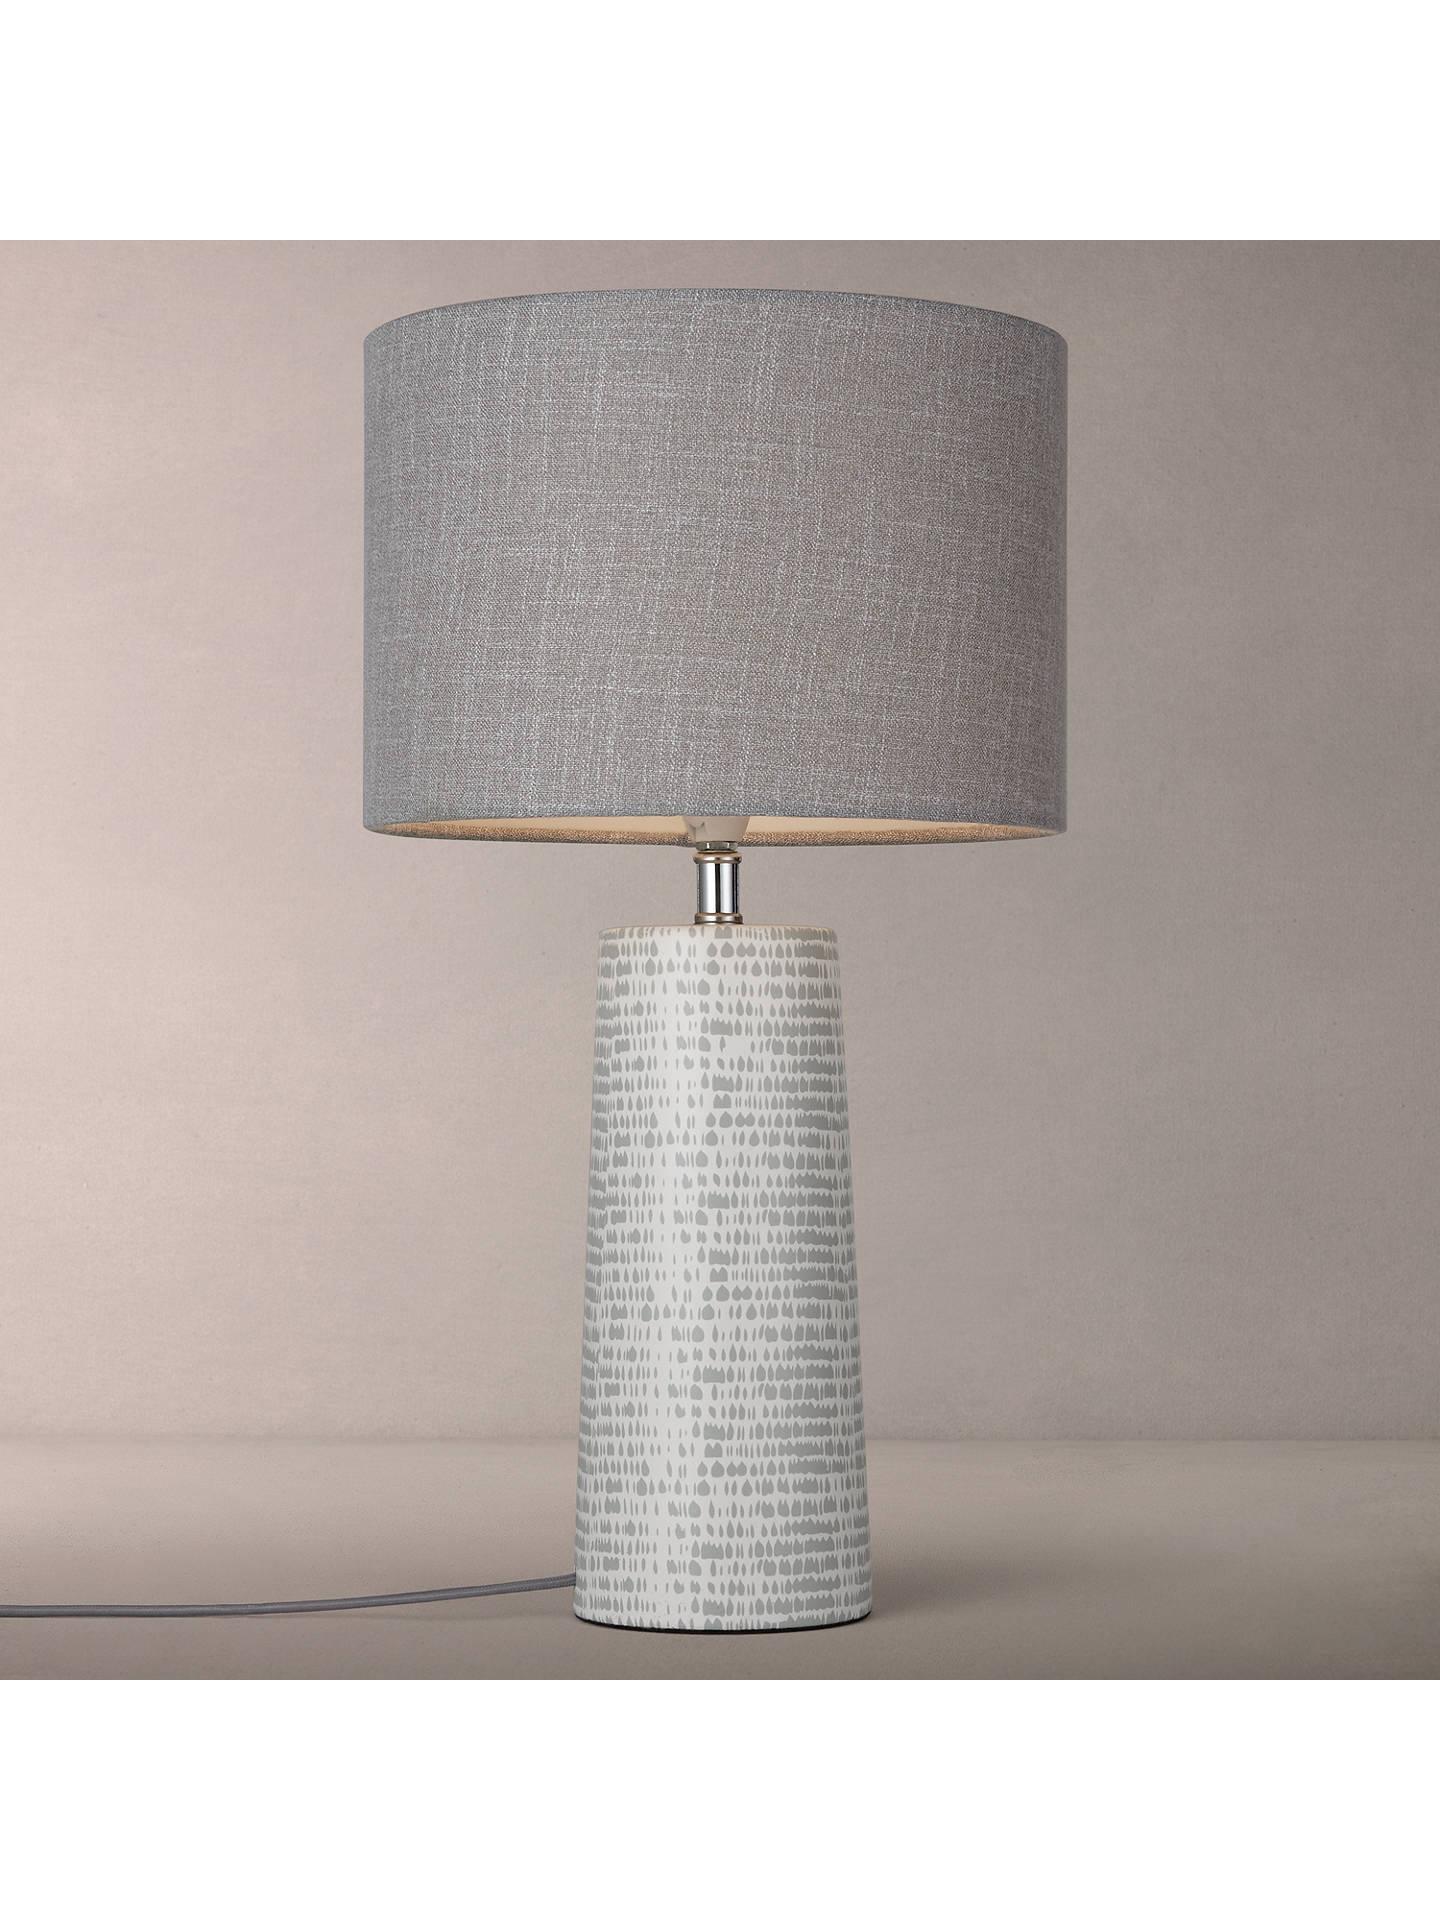 John lewis minna small ceramic cylinder table lamp grey at john buyjohn lewis minna small ceramic cylinder table lamp grey online at johnlewis aloadofball Choice Image